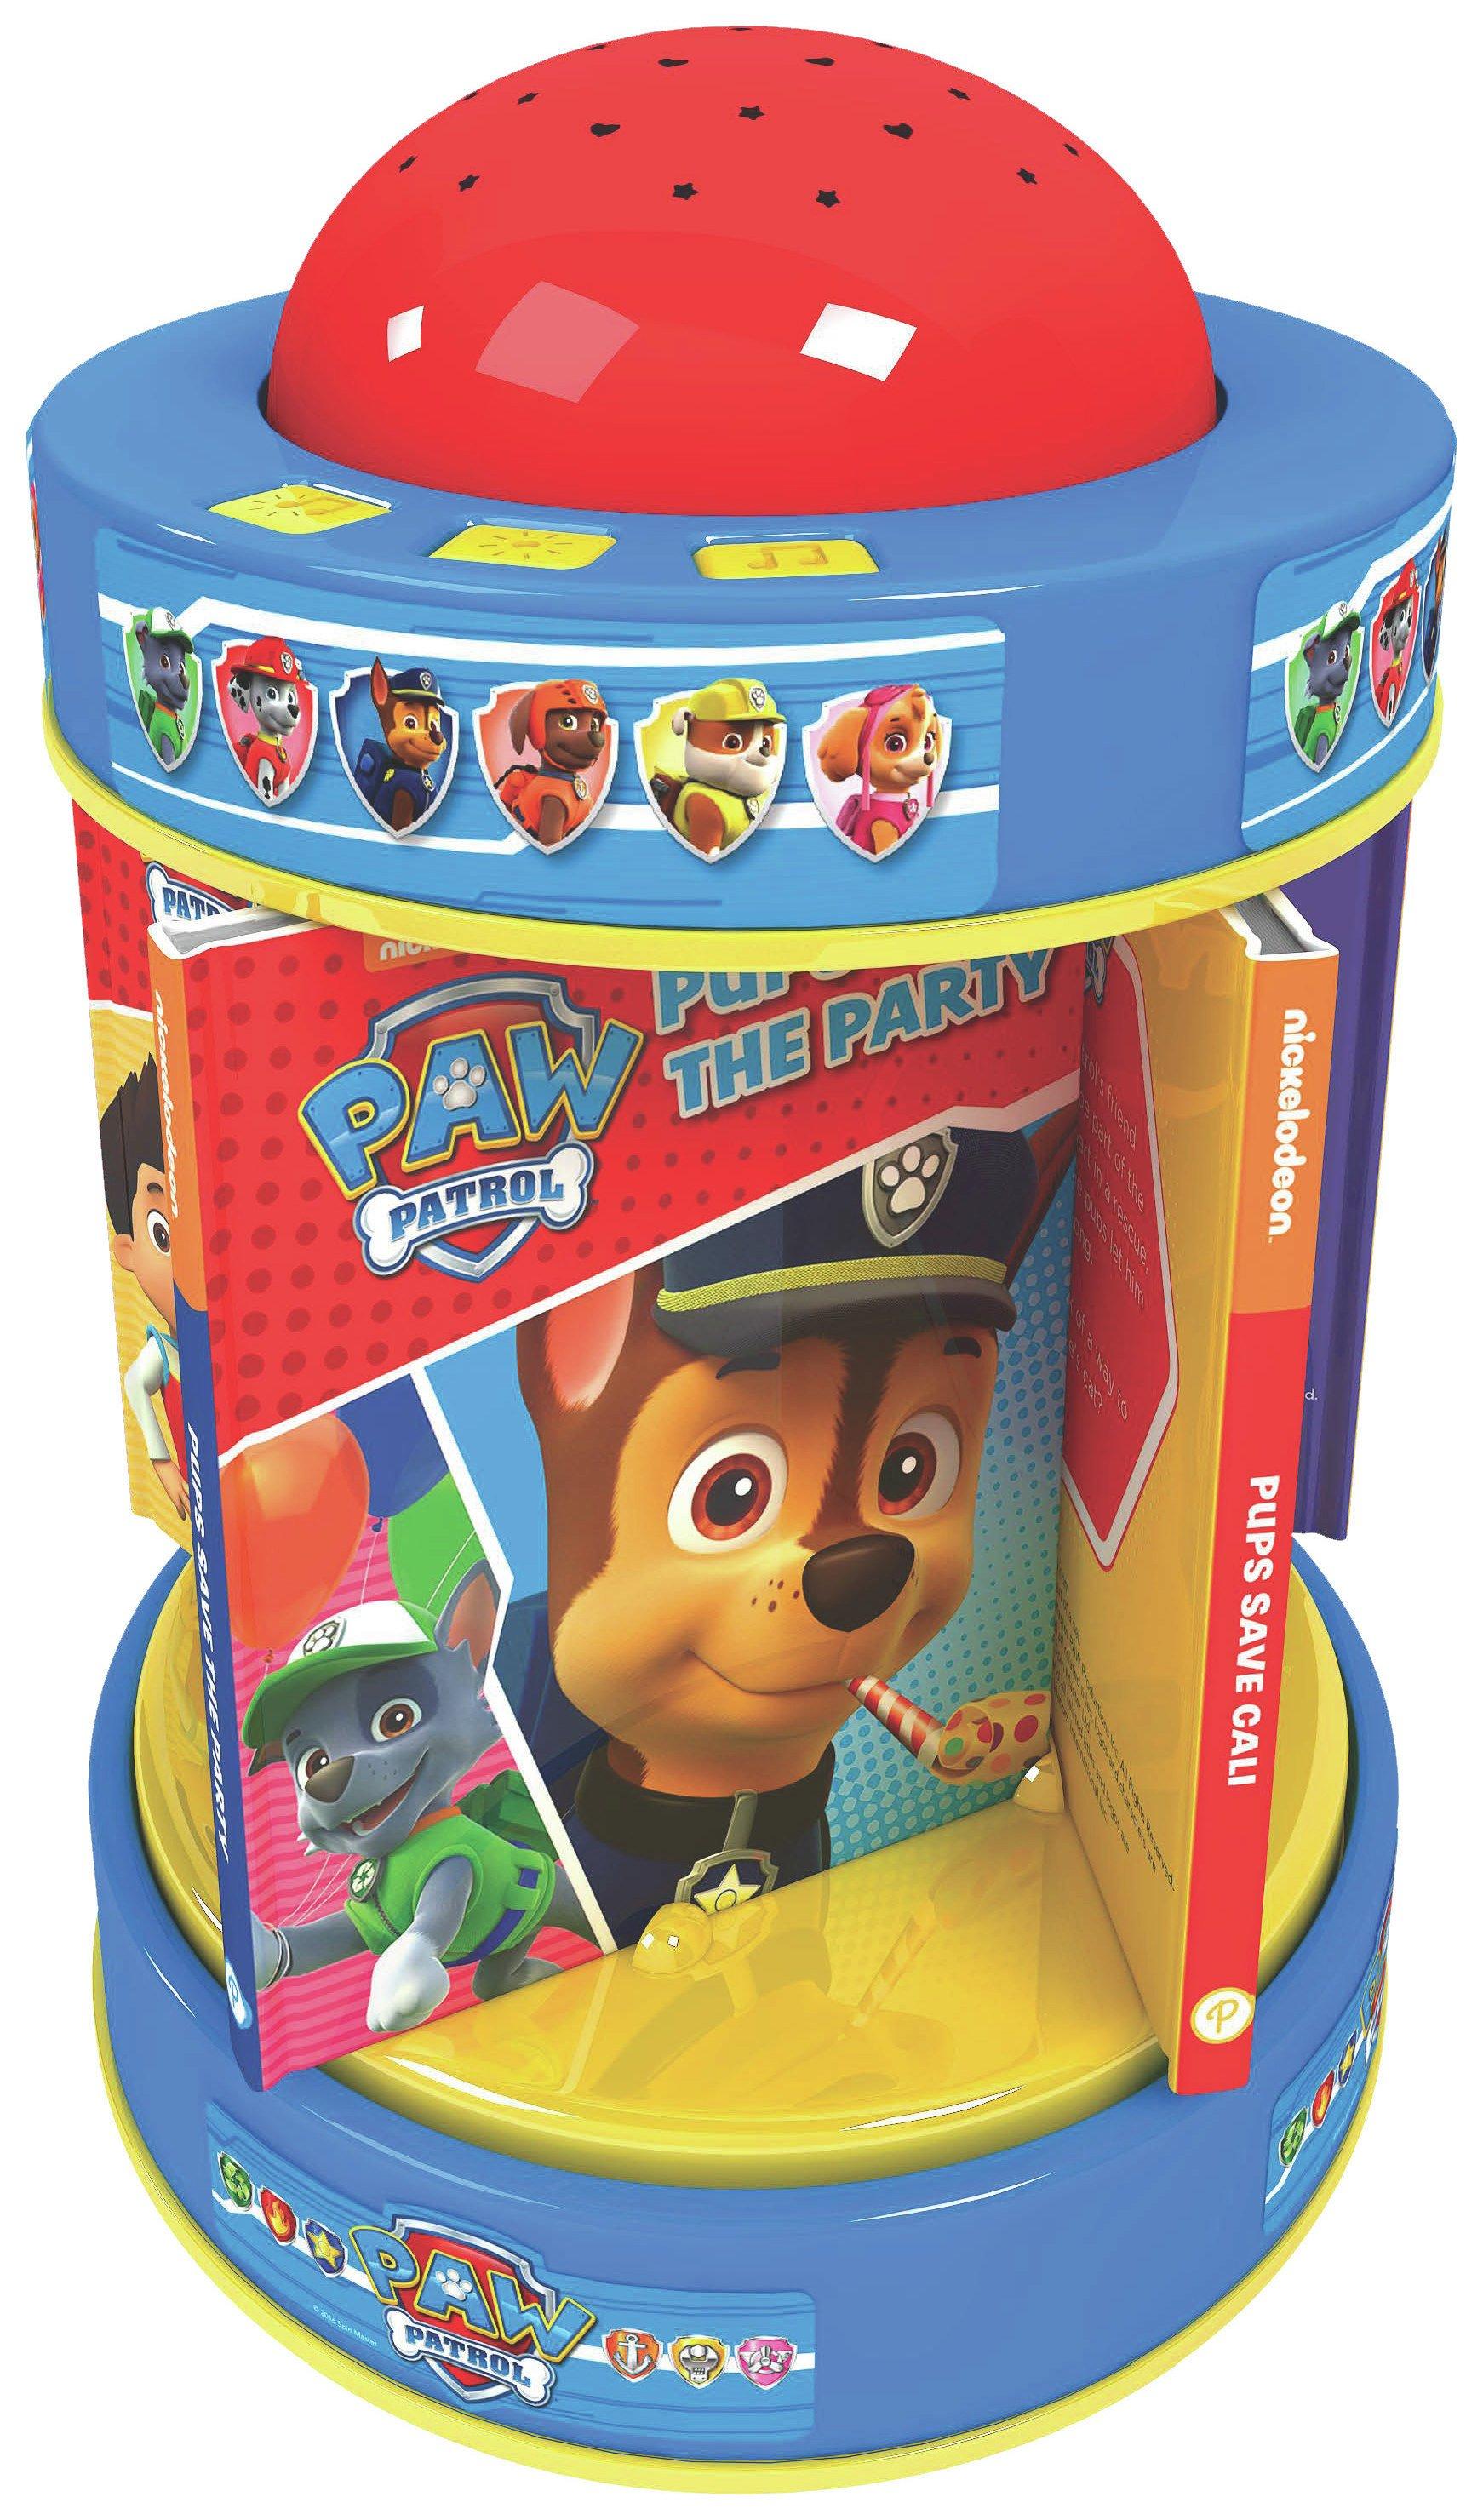 Nickelodeon Paw Patrol Sweet Dreams Library Carousel.